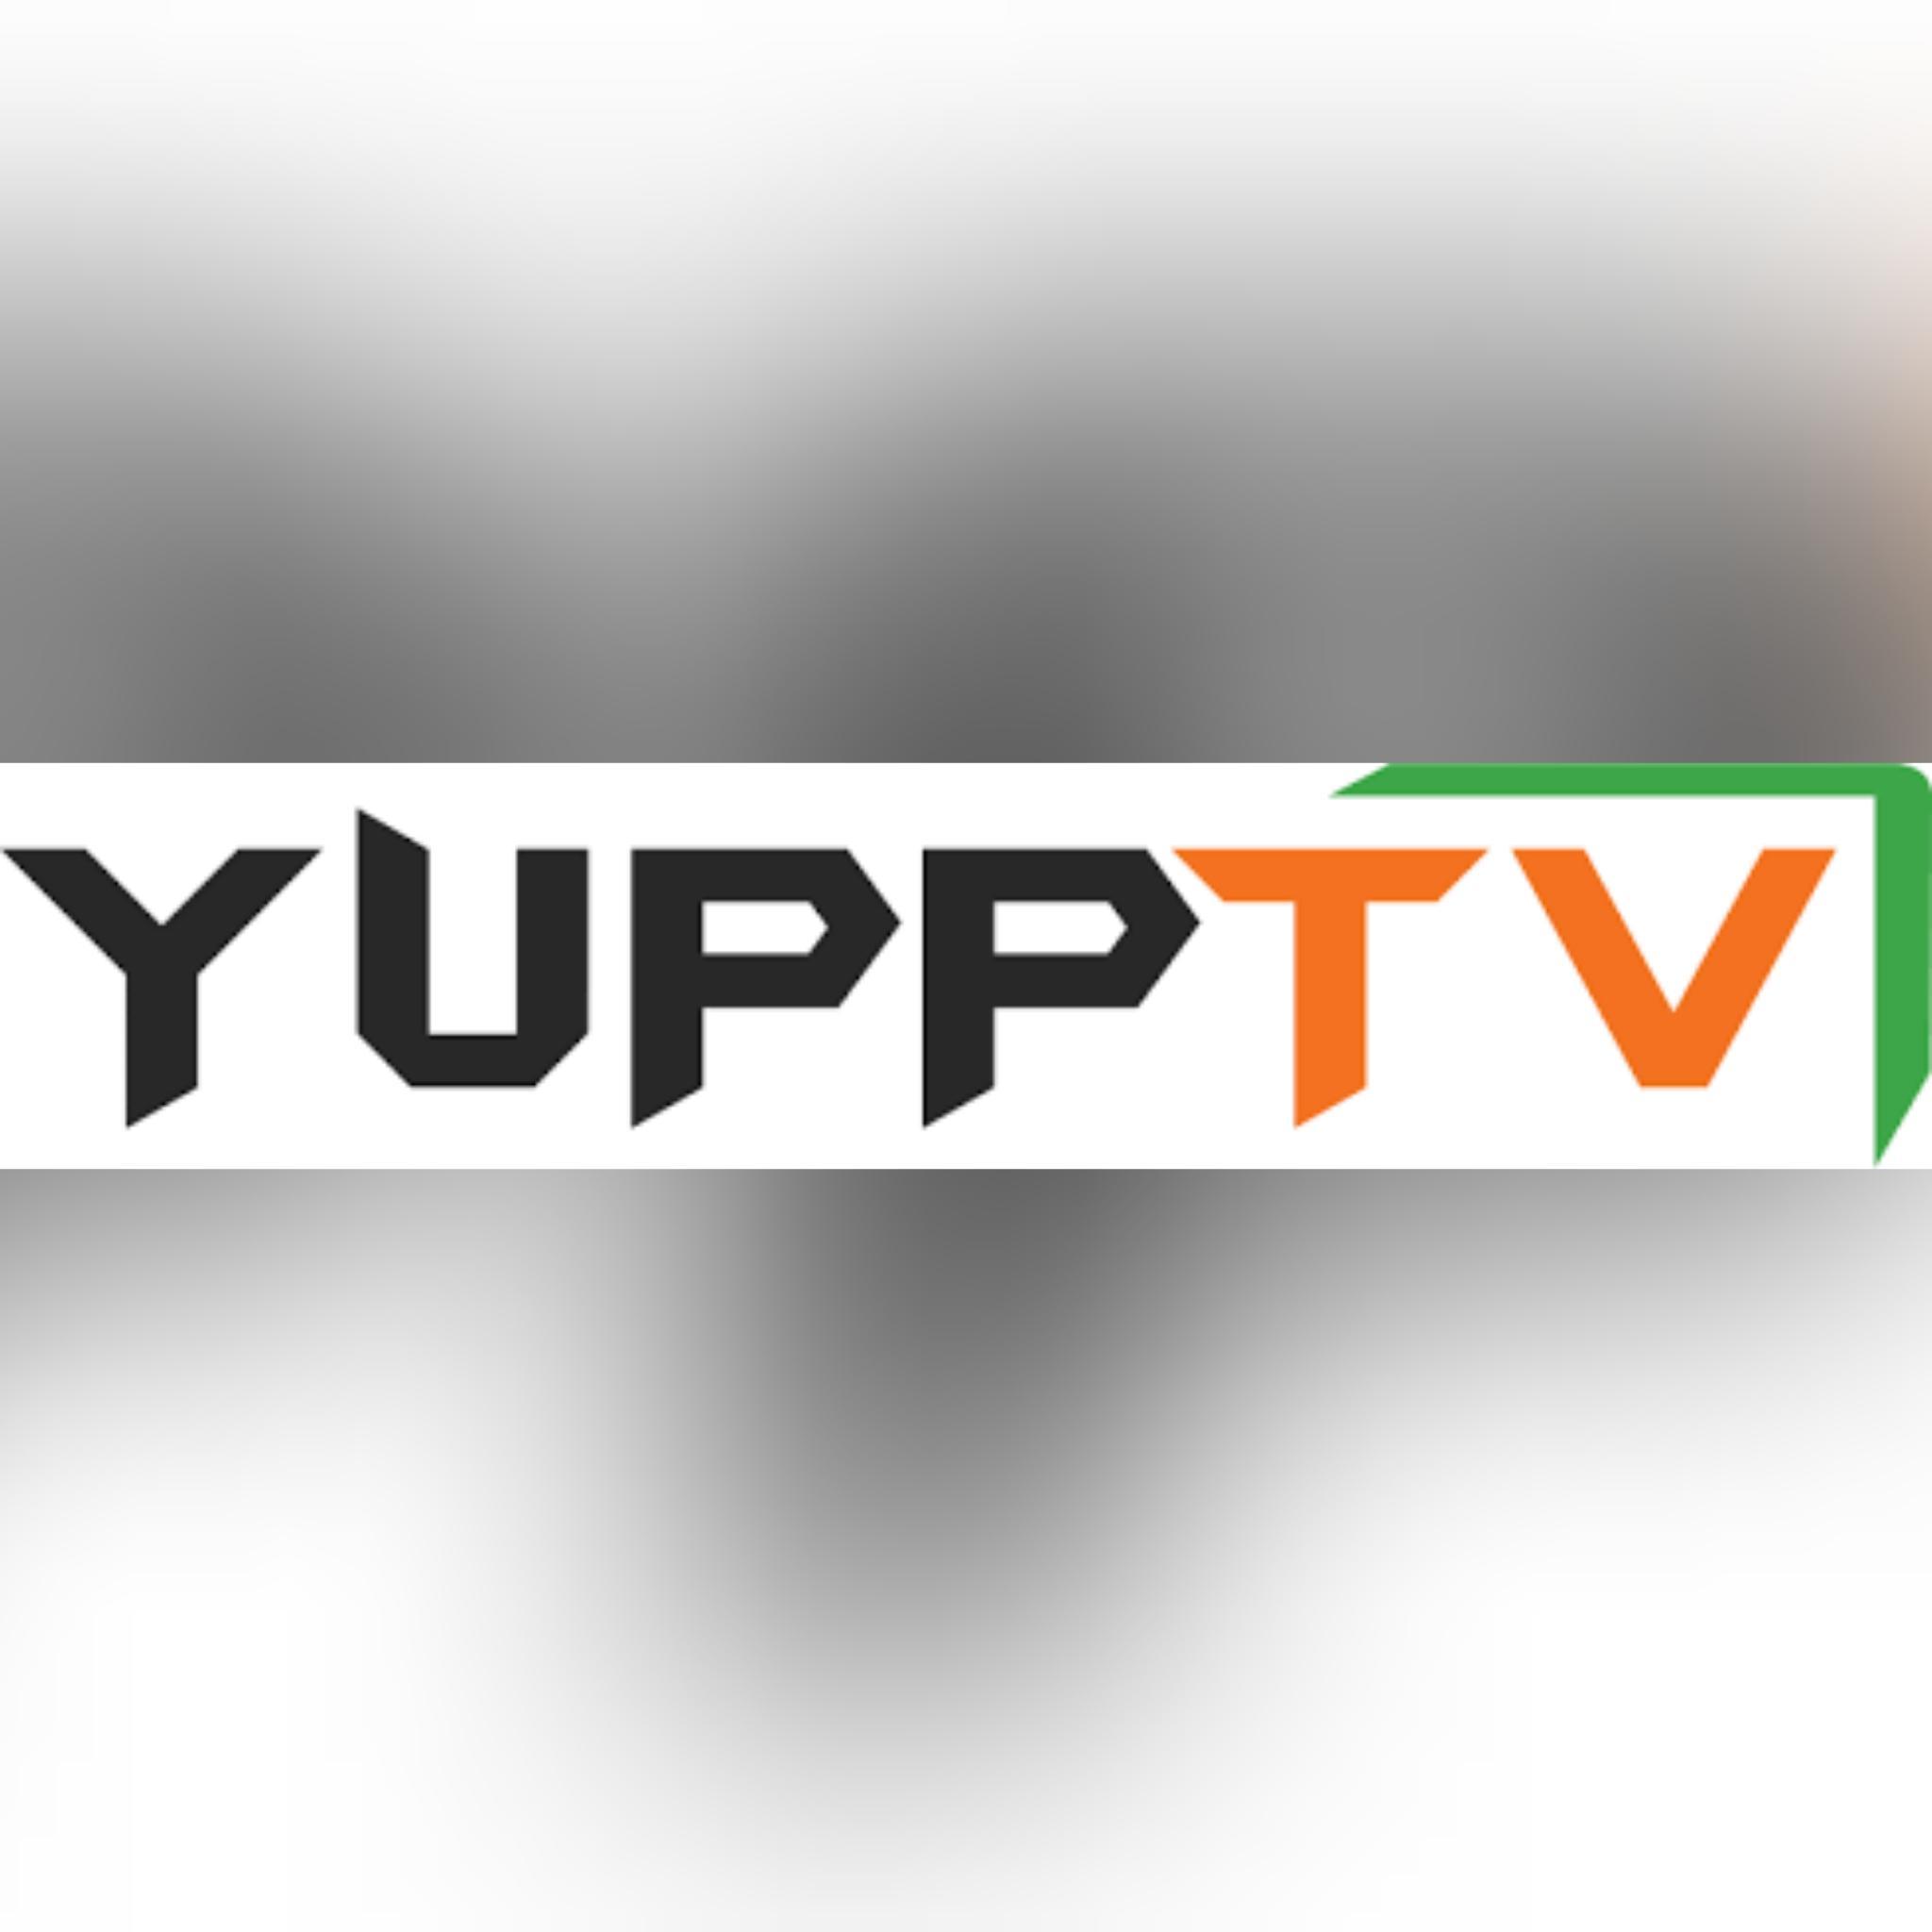 https://indiantelevision.com/sites/default/files/styles/smartcrop_800x800/public/images/tv-images/2021/06/30/photogrid_plus_1625053099832.jpg?itok=z6H-OMw-